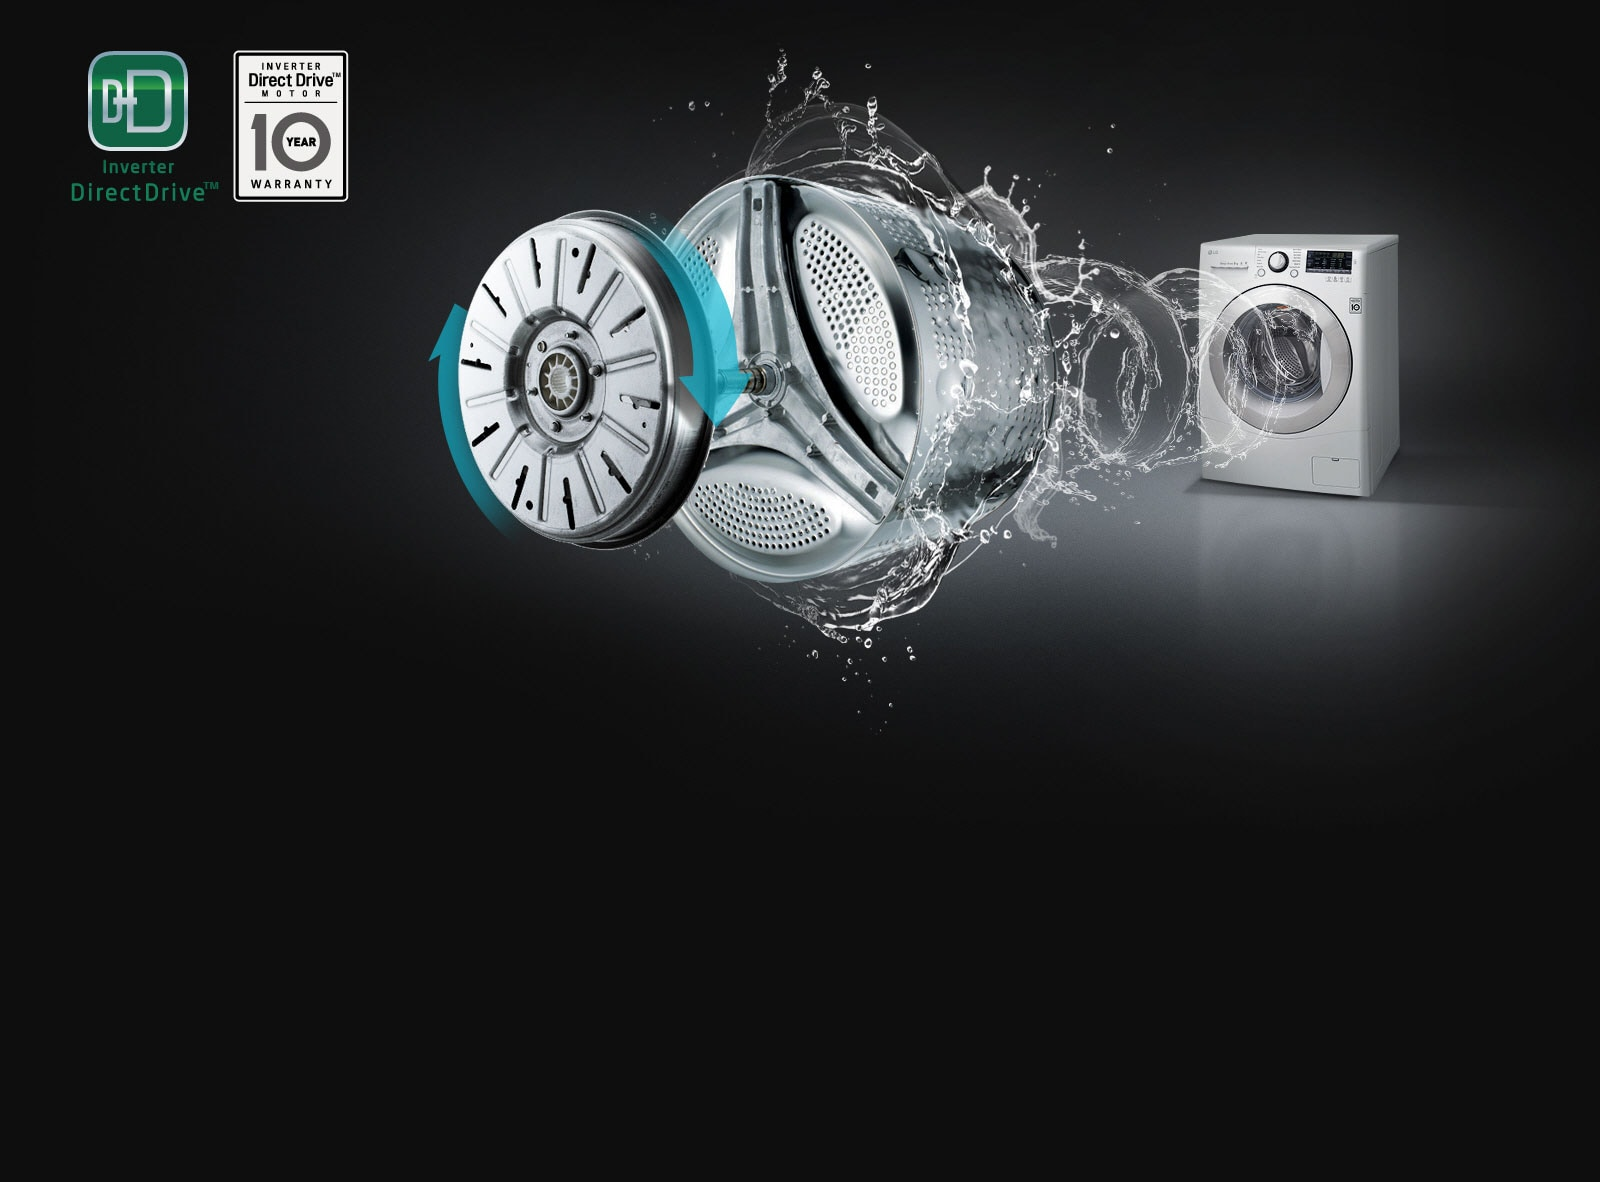 LG 7kg, 6 Motion Inverter Direct Drive Front Load Washing Machine